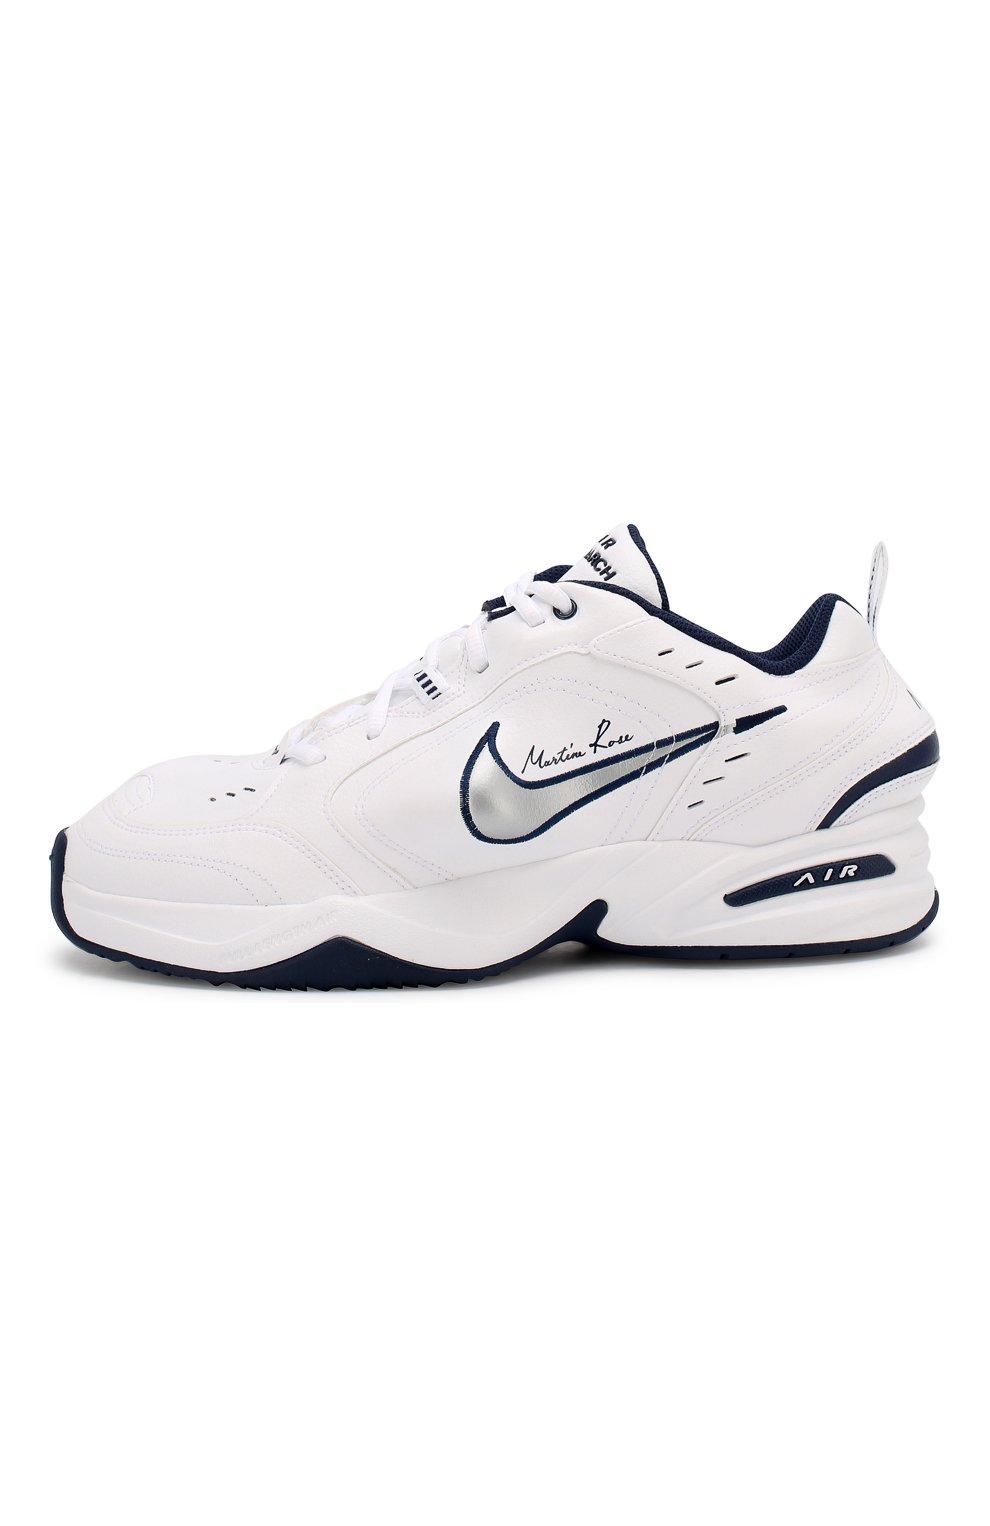 6efbec2f9 Кожаные кроссовки NikeLab x Martine Rose Air Monarch IV NikeLab белые |  Фото №3